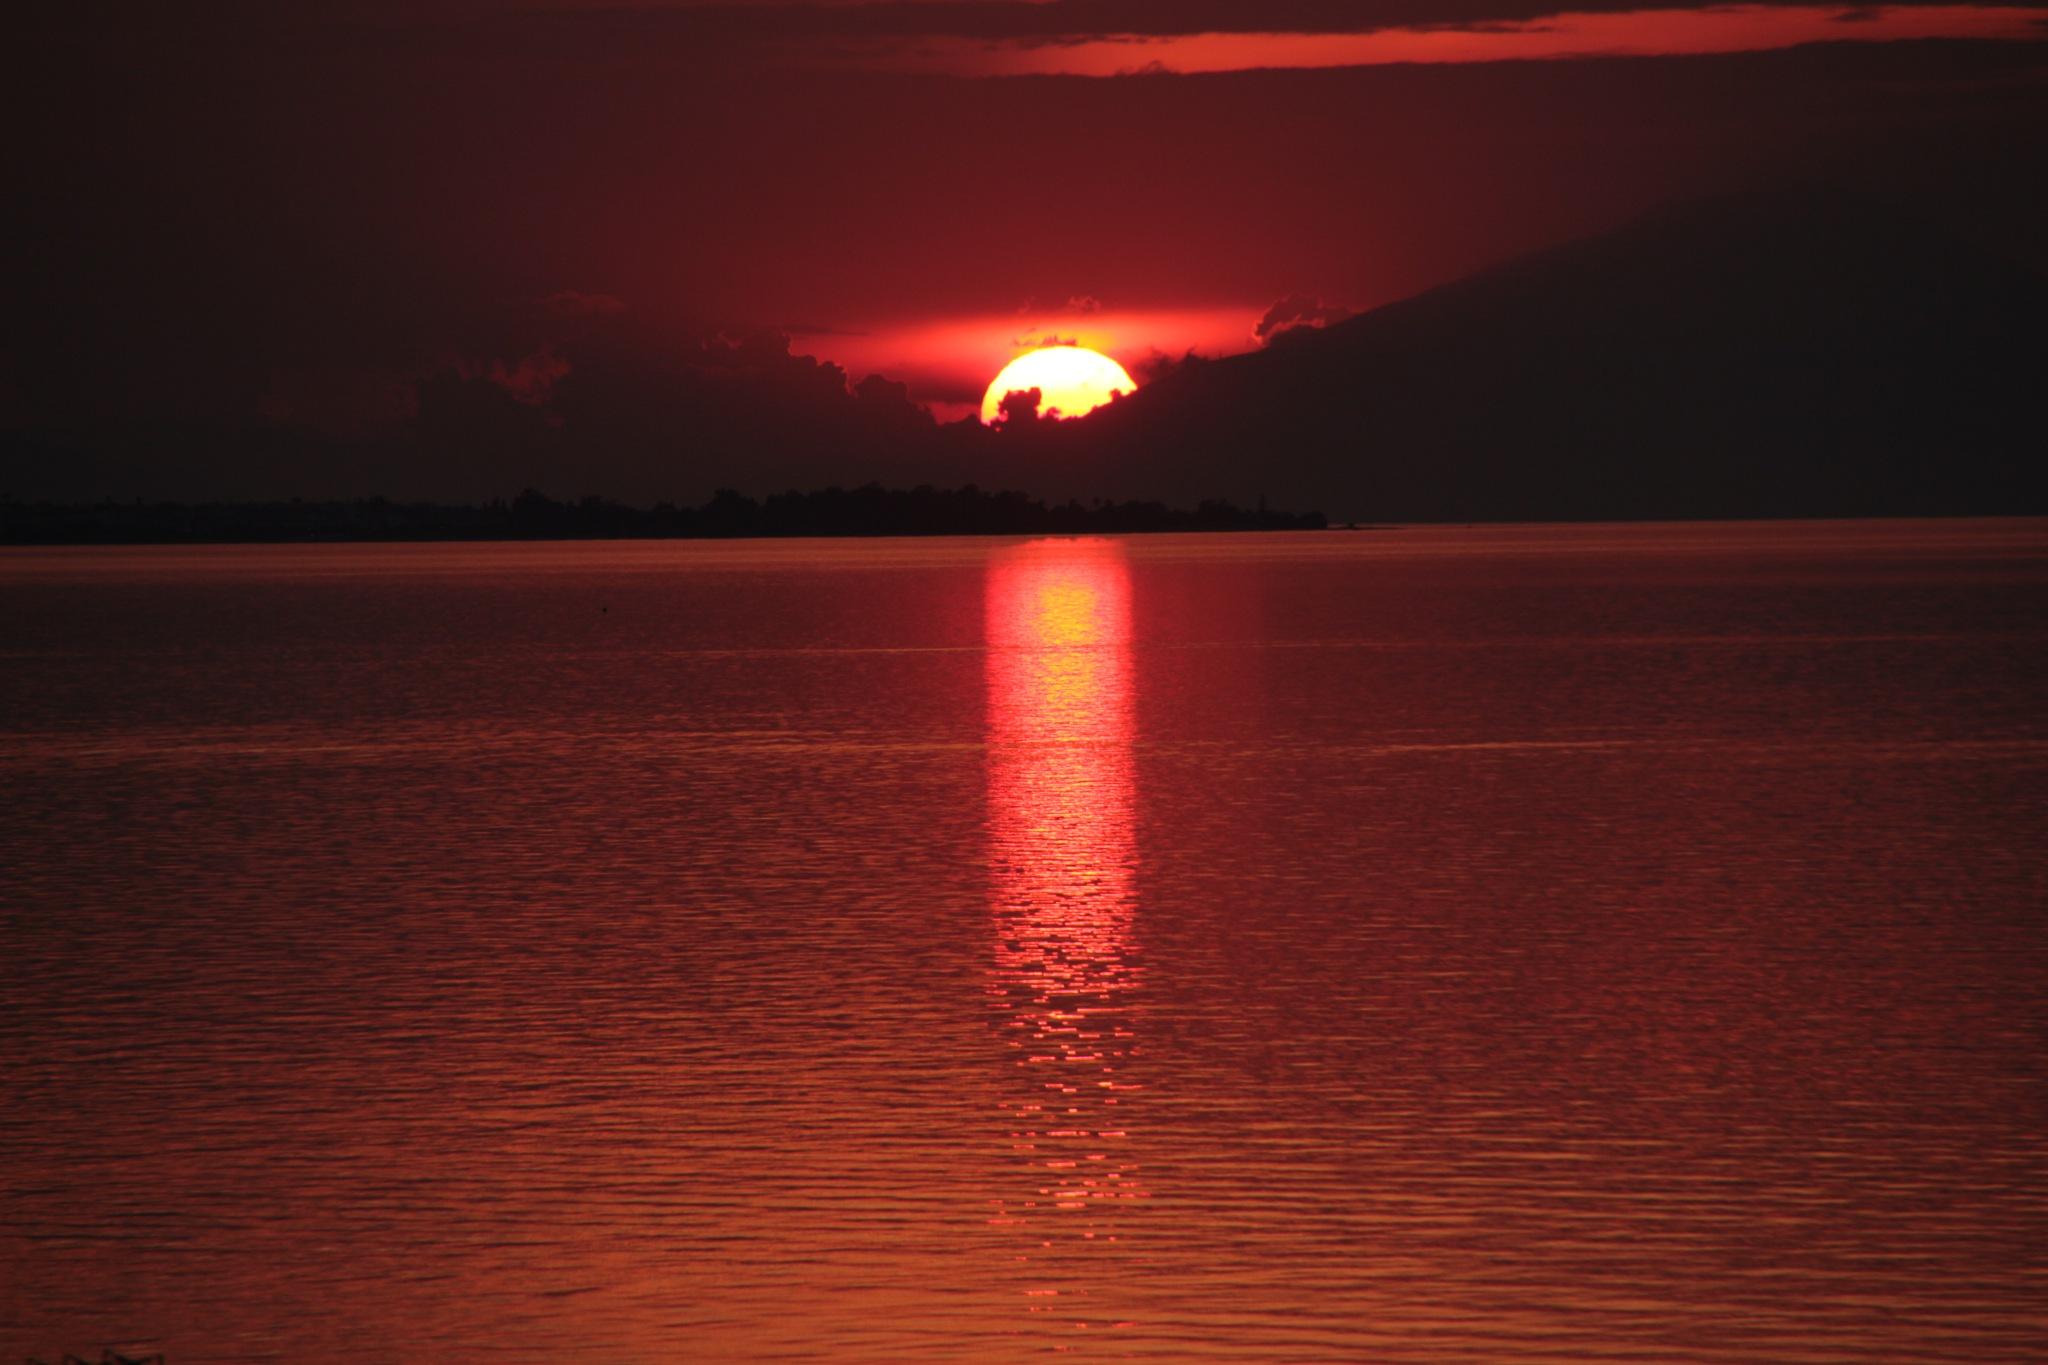 Sunset by inge.kanakarisW